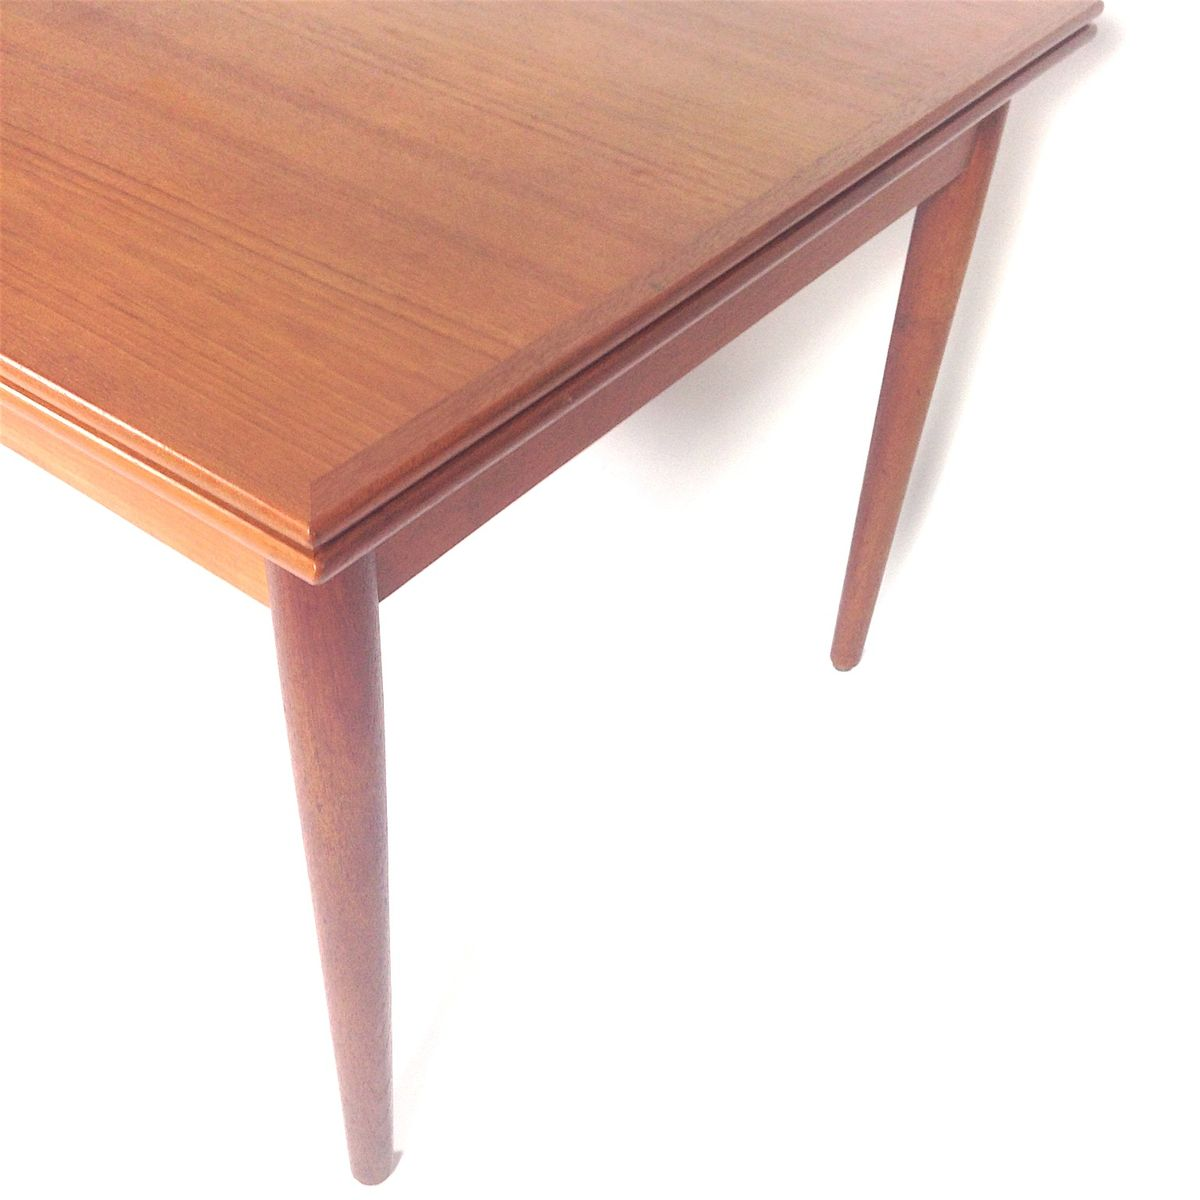 Extendable Teak Dining Table from Hornslet M248belfabrik  : extendable teak dining table from hornslet mobelfabrik 1950s 6 from www.pamono.co.uk size 1200 x 1200 jpeg 67kB